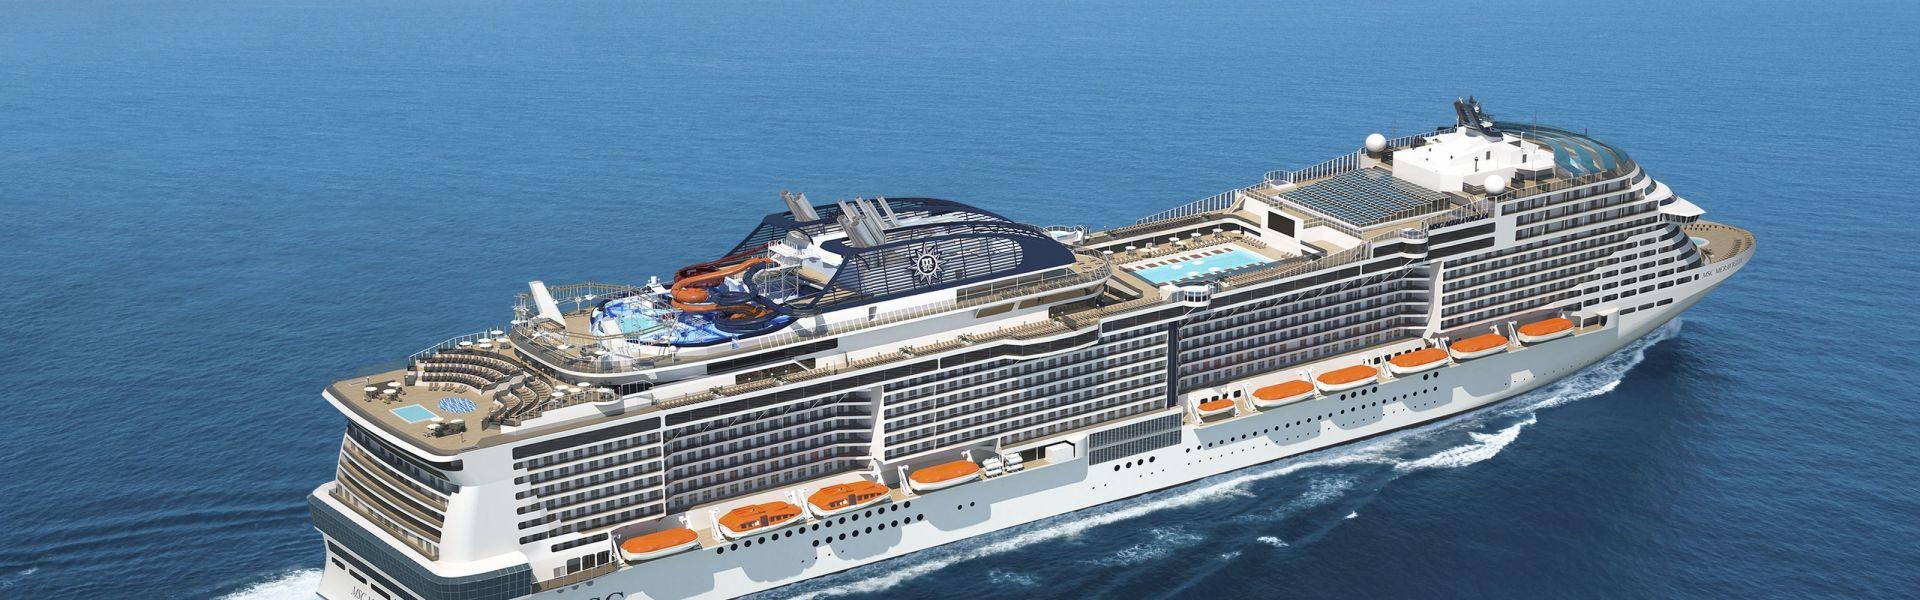 Croaziera 2017 - Mediterana de Vest (Barcelona) - MSC Cruises - MSC Meraviglia - Septembrie - Noiembrie - 7 nopti